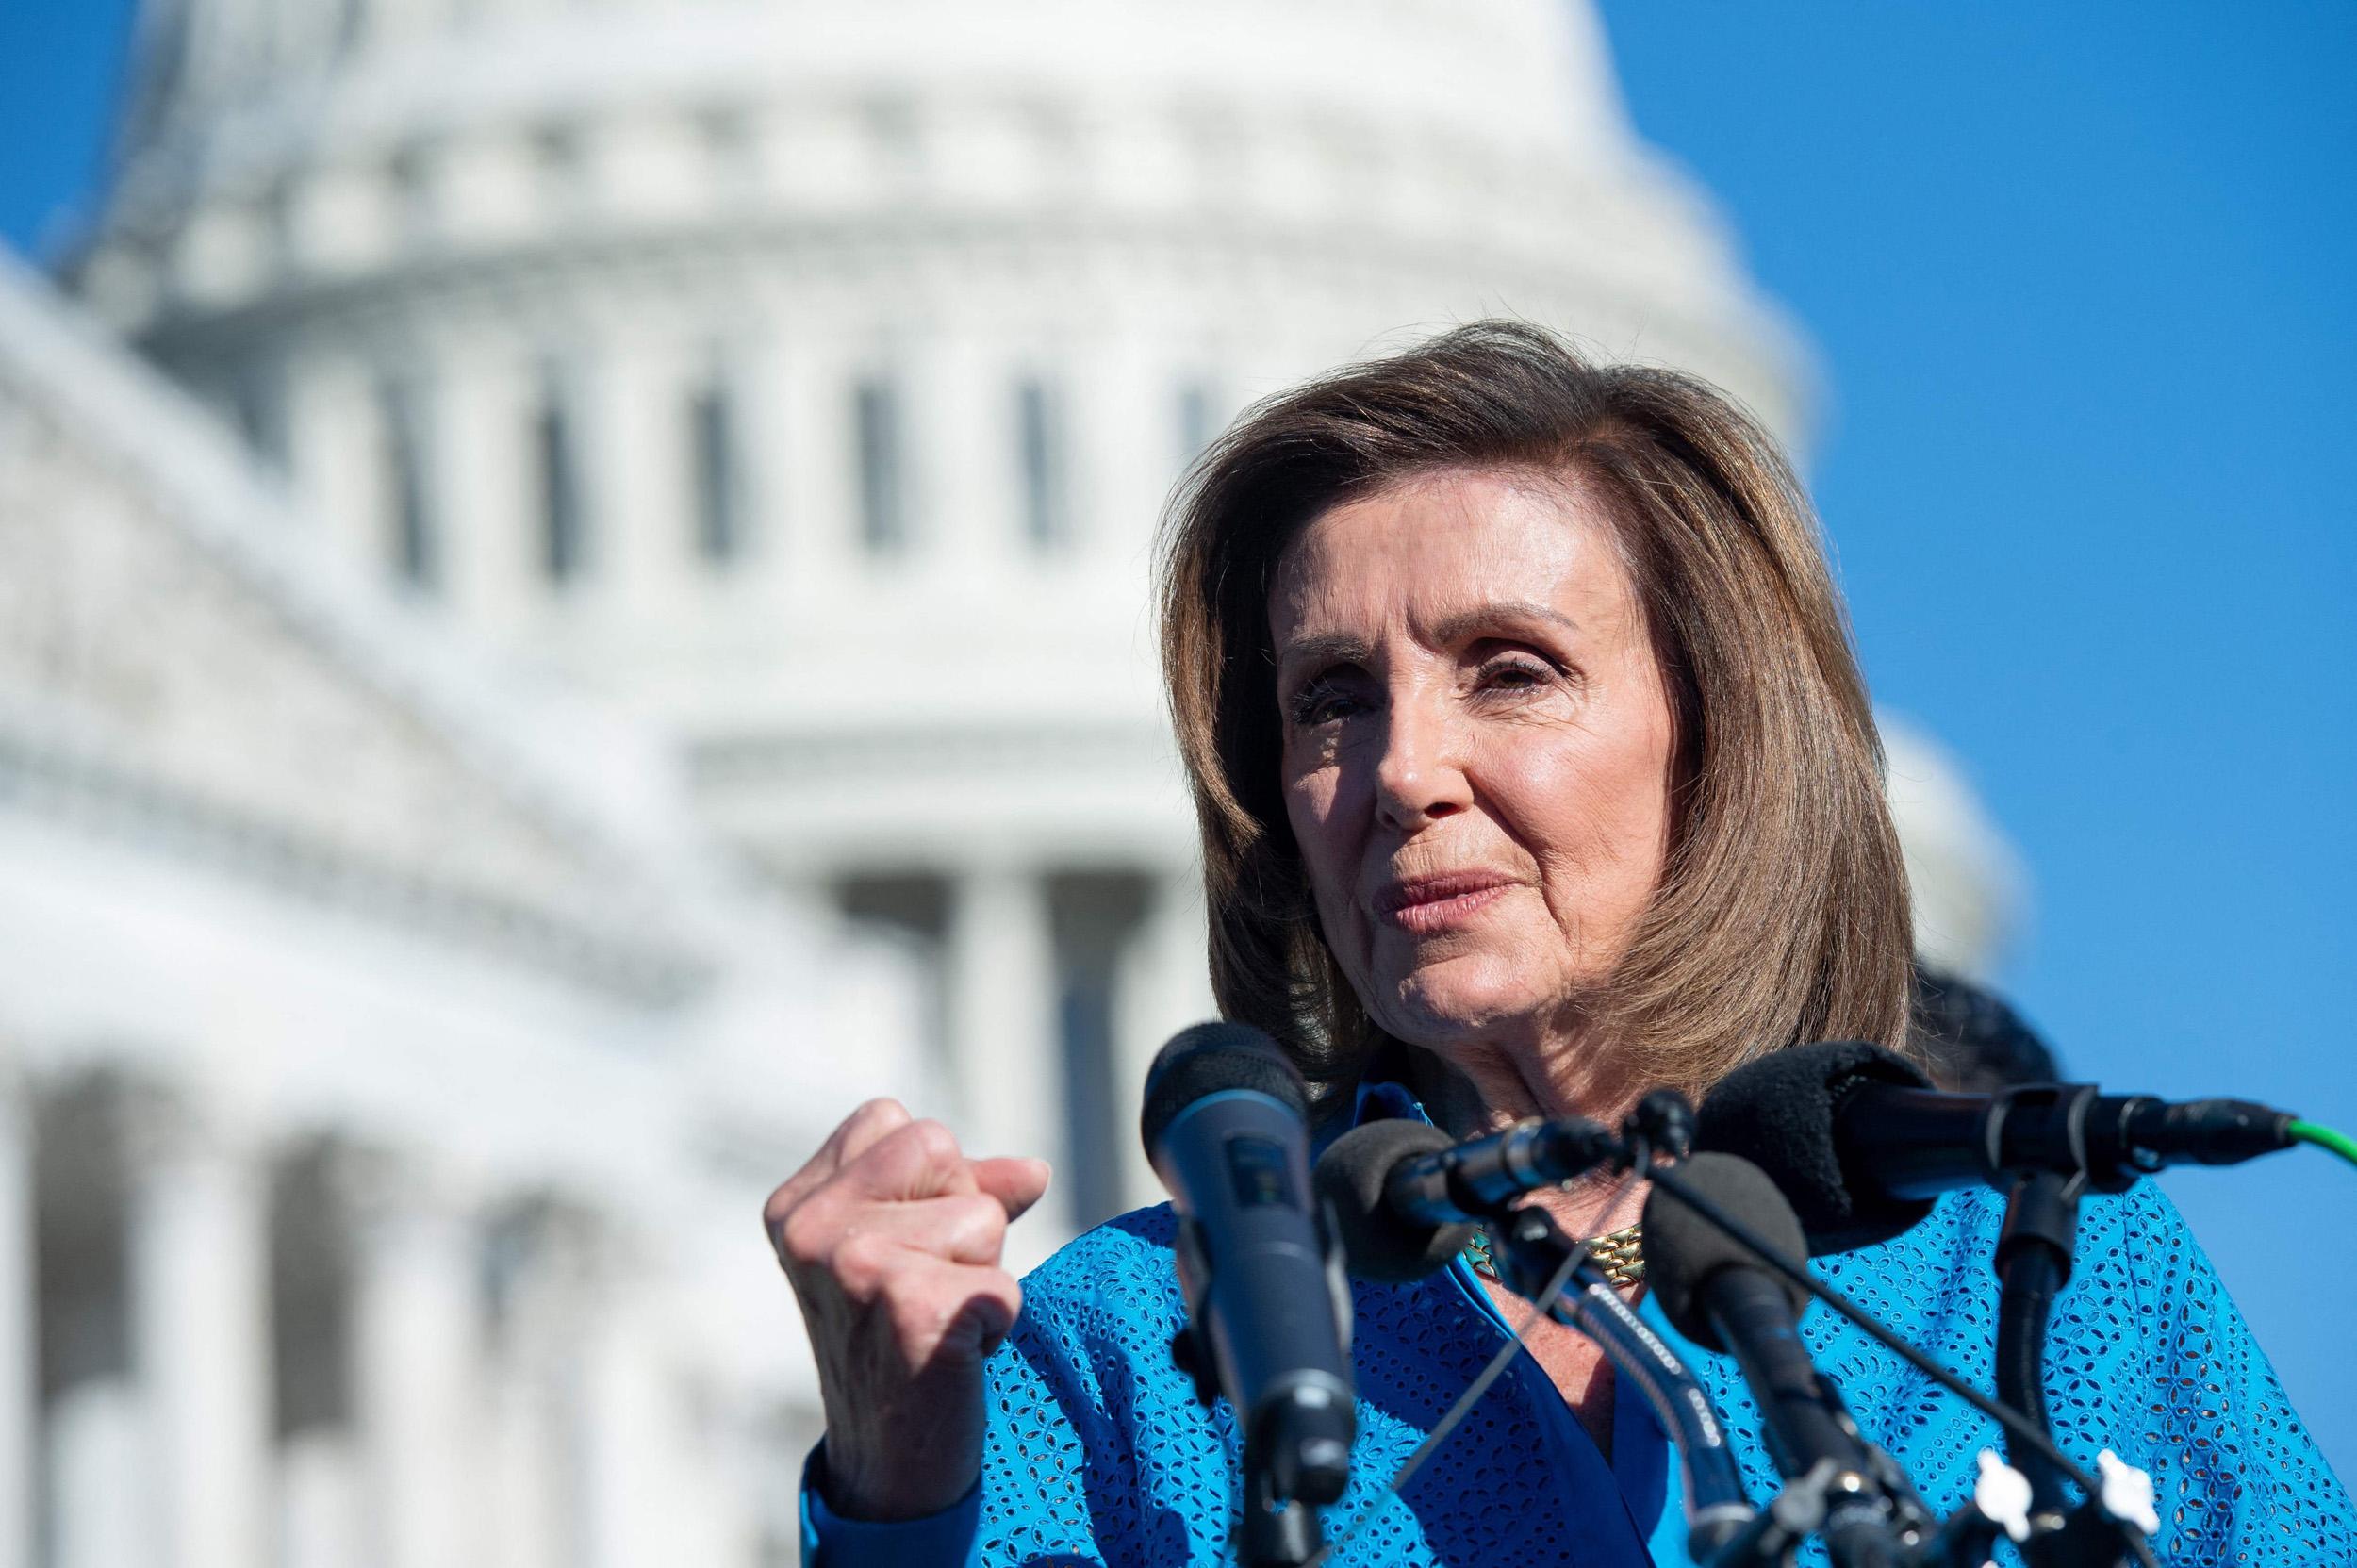 House to debate, vote on infrastructure package this week